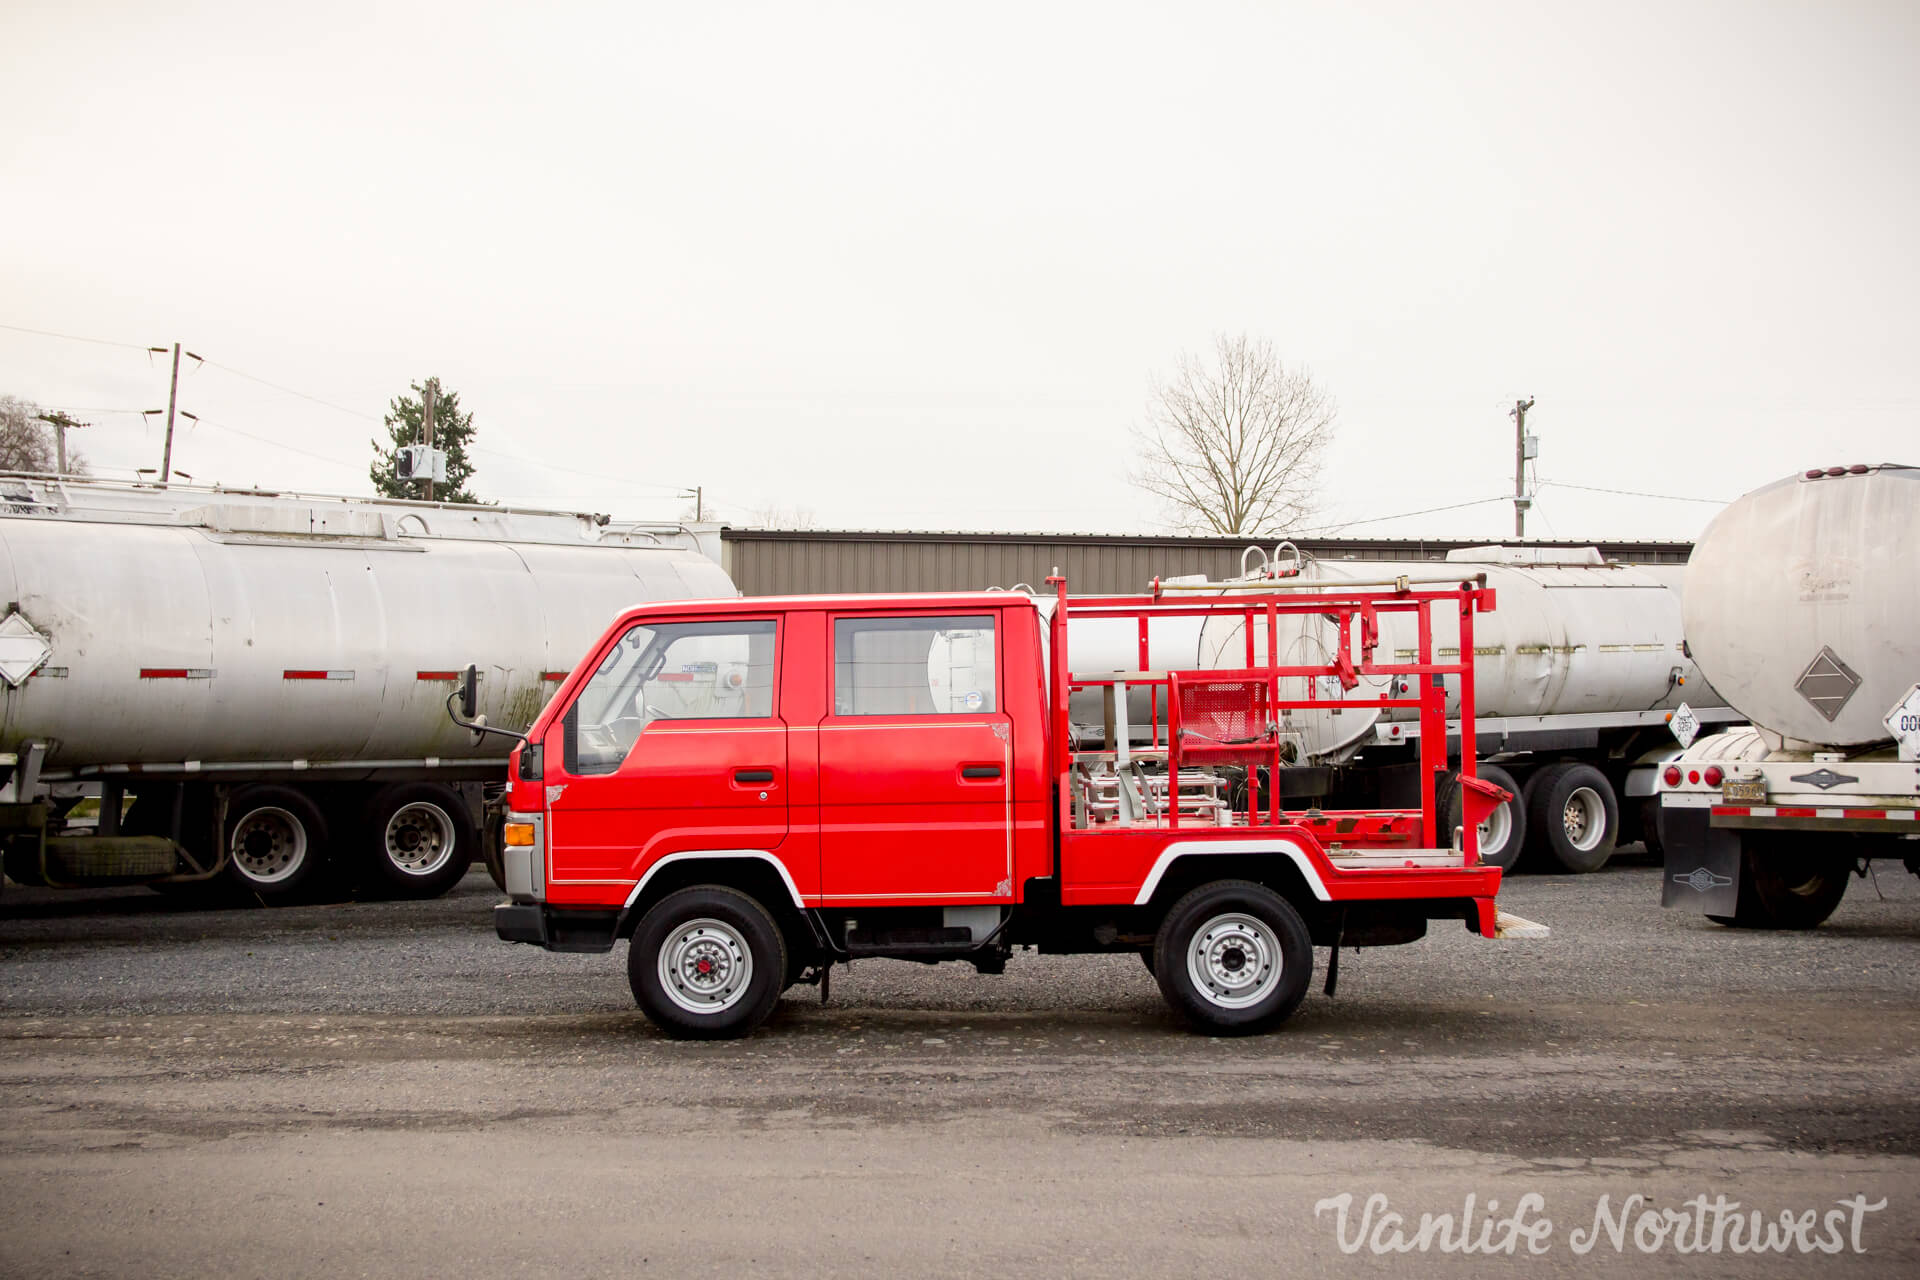 ToyotaHiaceFireTruckLH851990-17.jpg